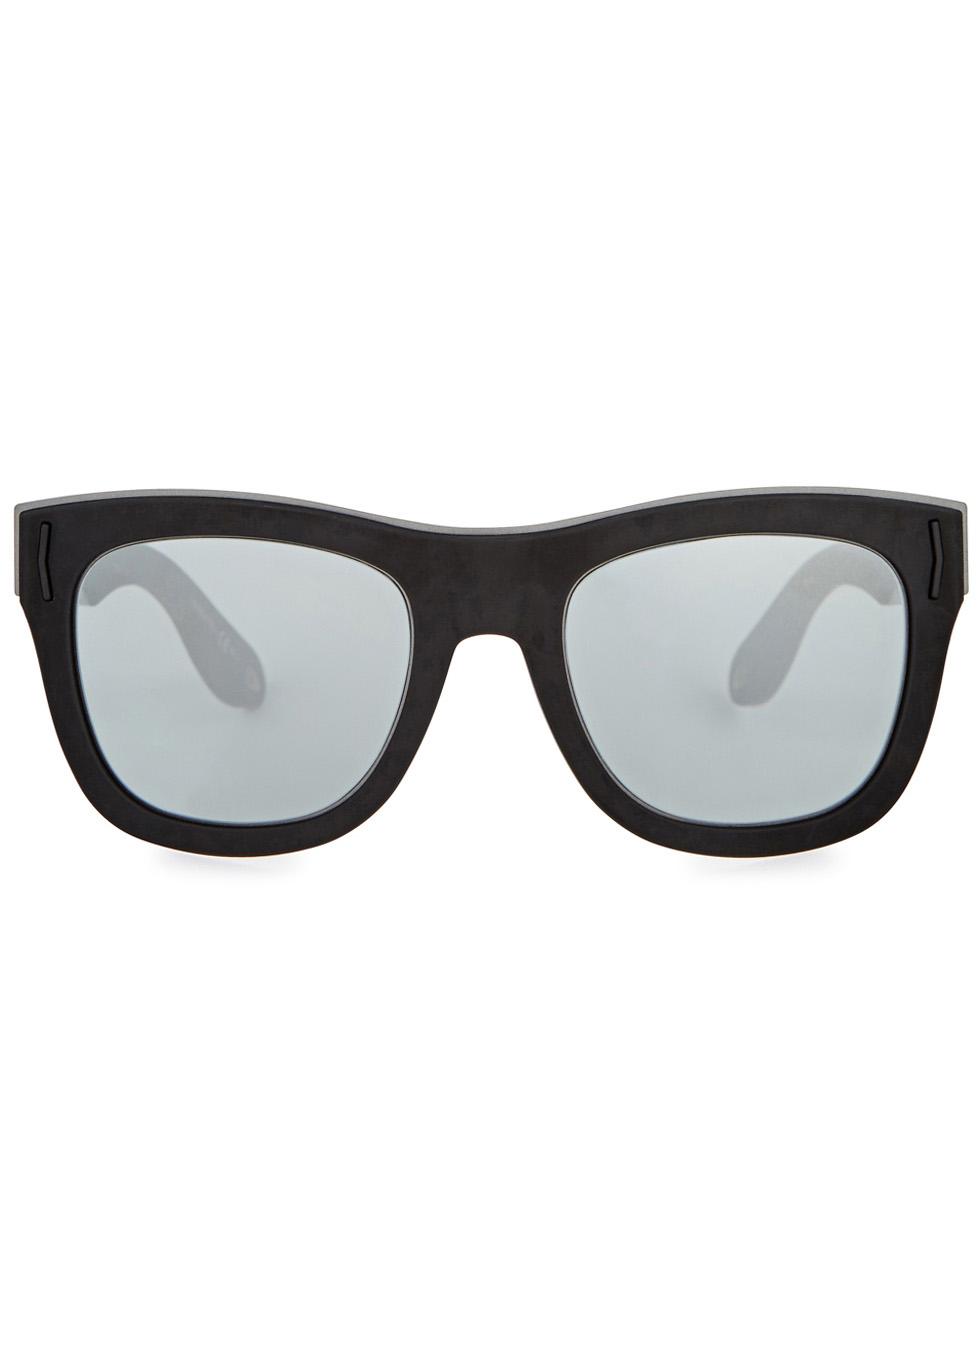 Matte black wayfarer-style sunglasses - Givenchy